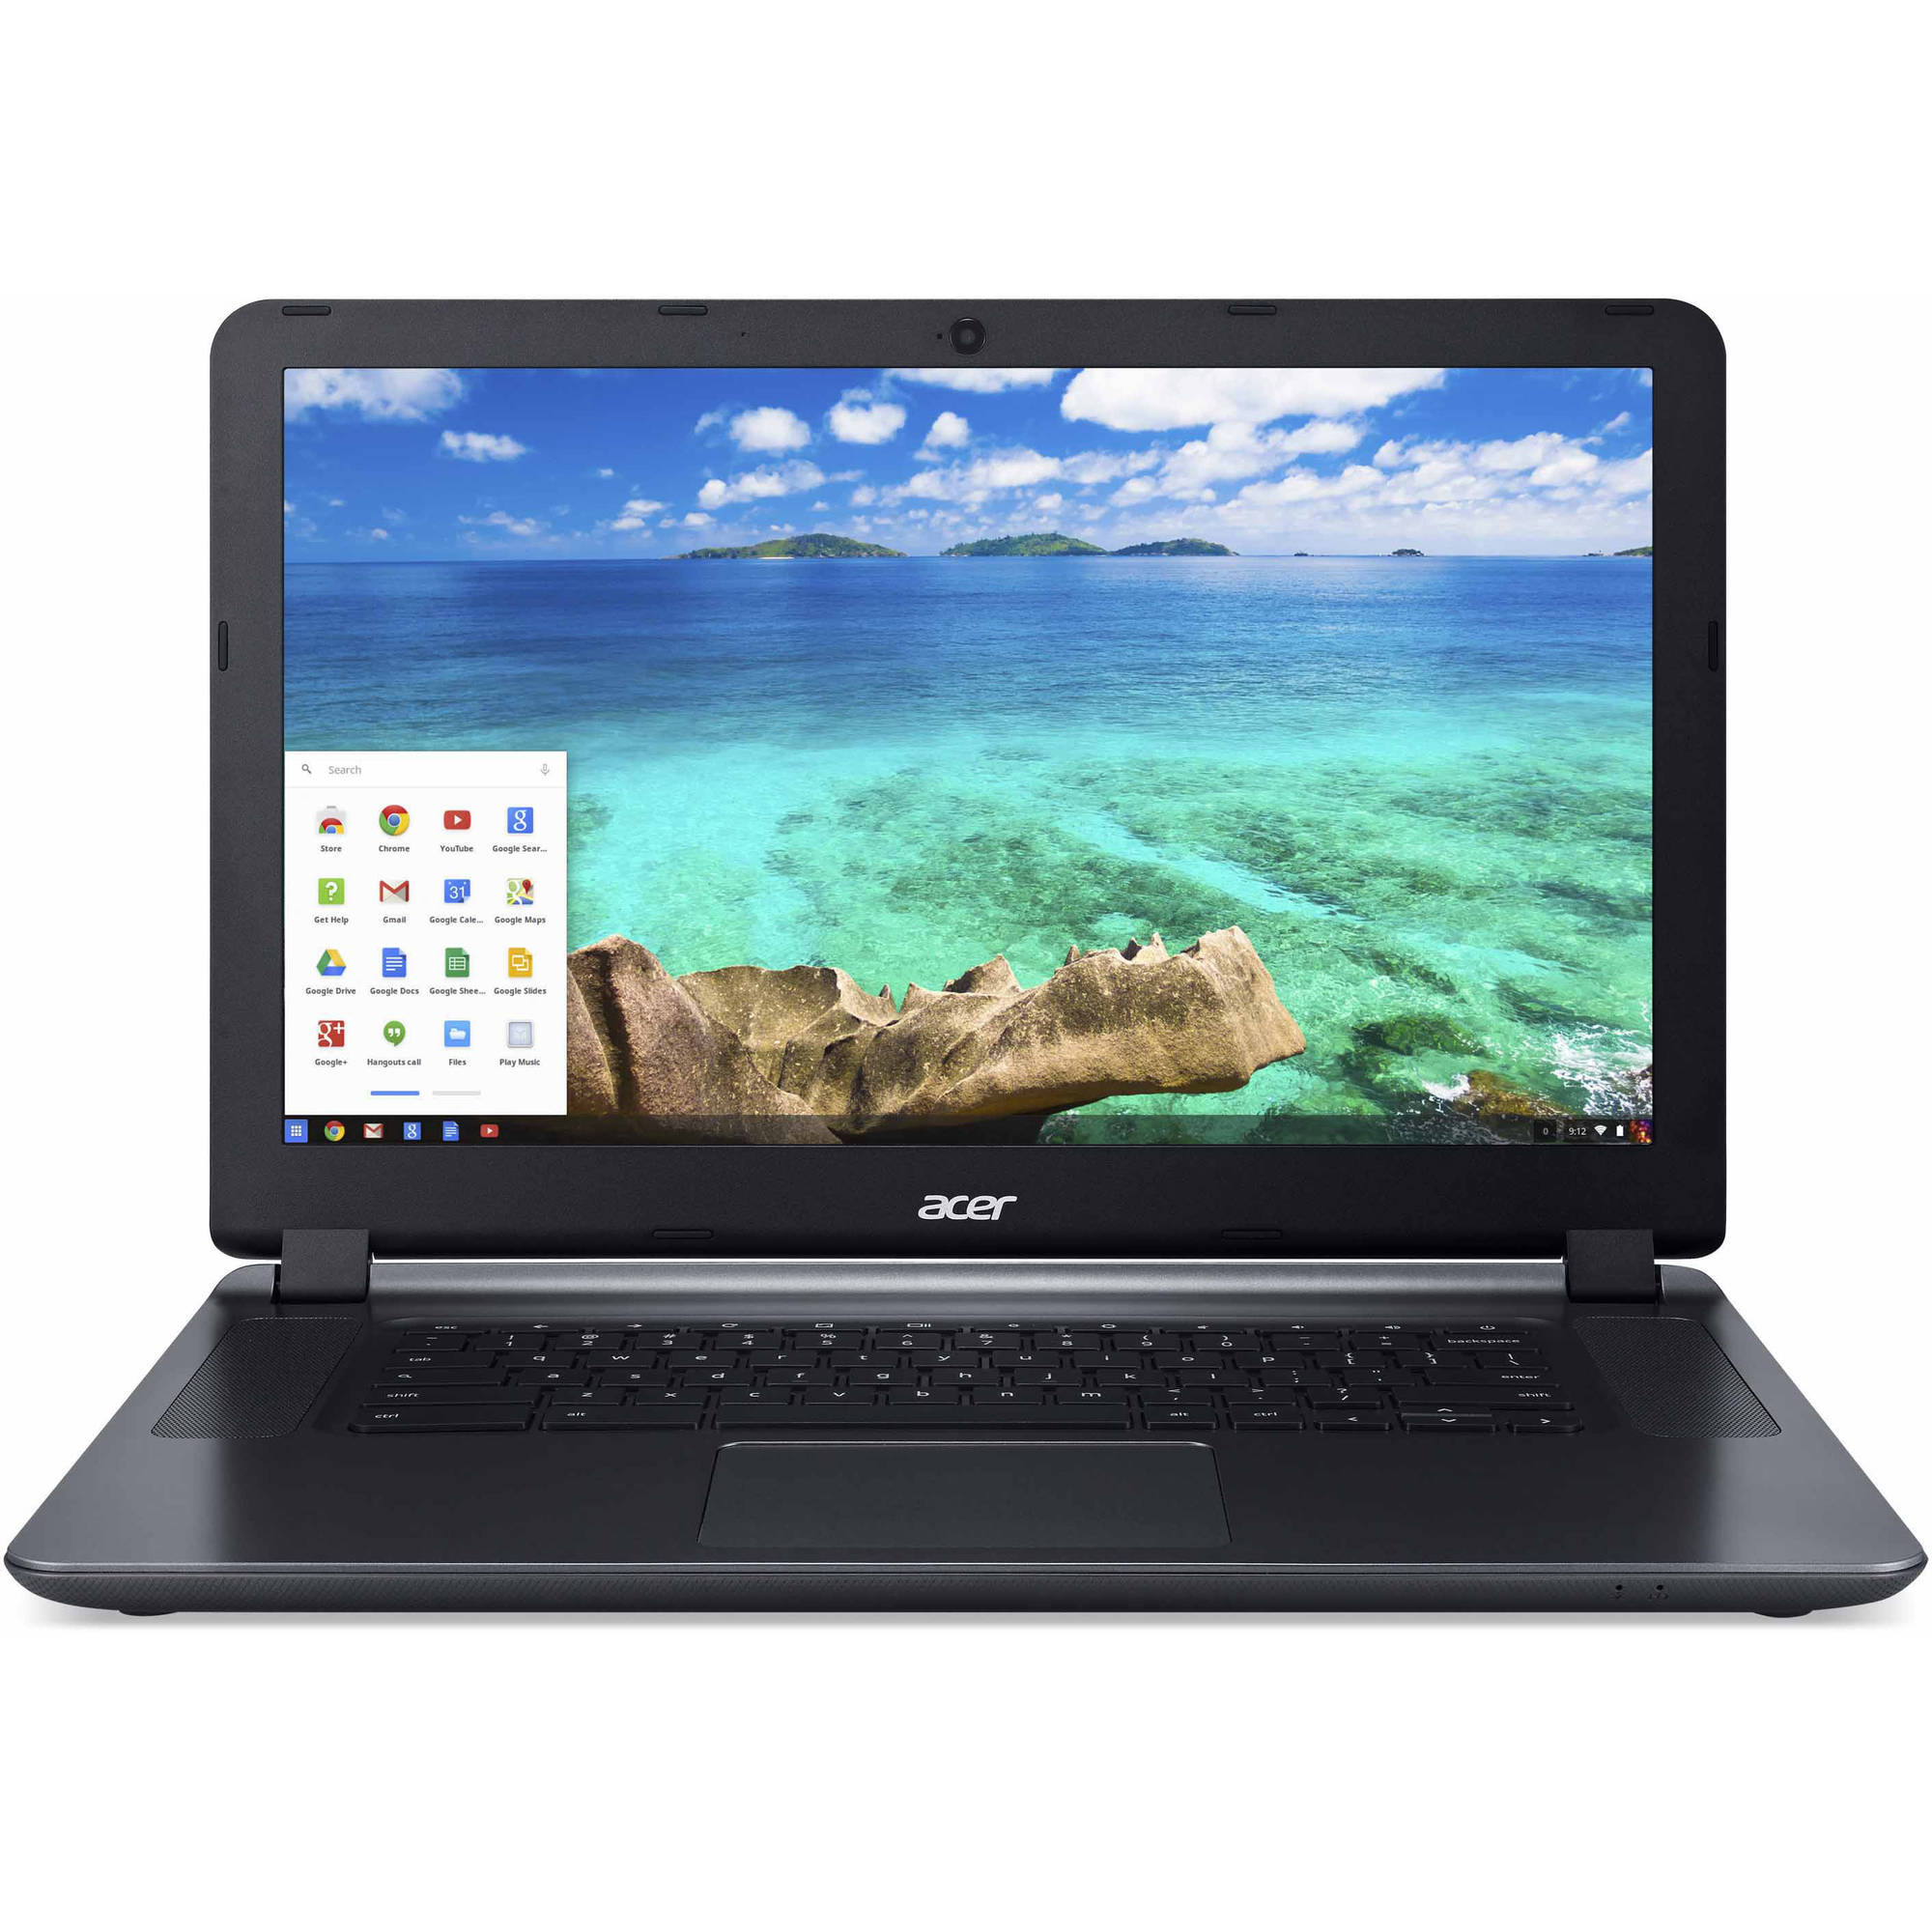 Notebook samsung dual core 4gb - Acer Granite Gray 15 6 Cb3 531 C4a5 Chromebook Pc With Intel Celeron N2830 Dual Core Processor 2gb Memory 16gb Hard Drive And Chrome Os Walmart Com